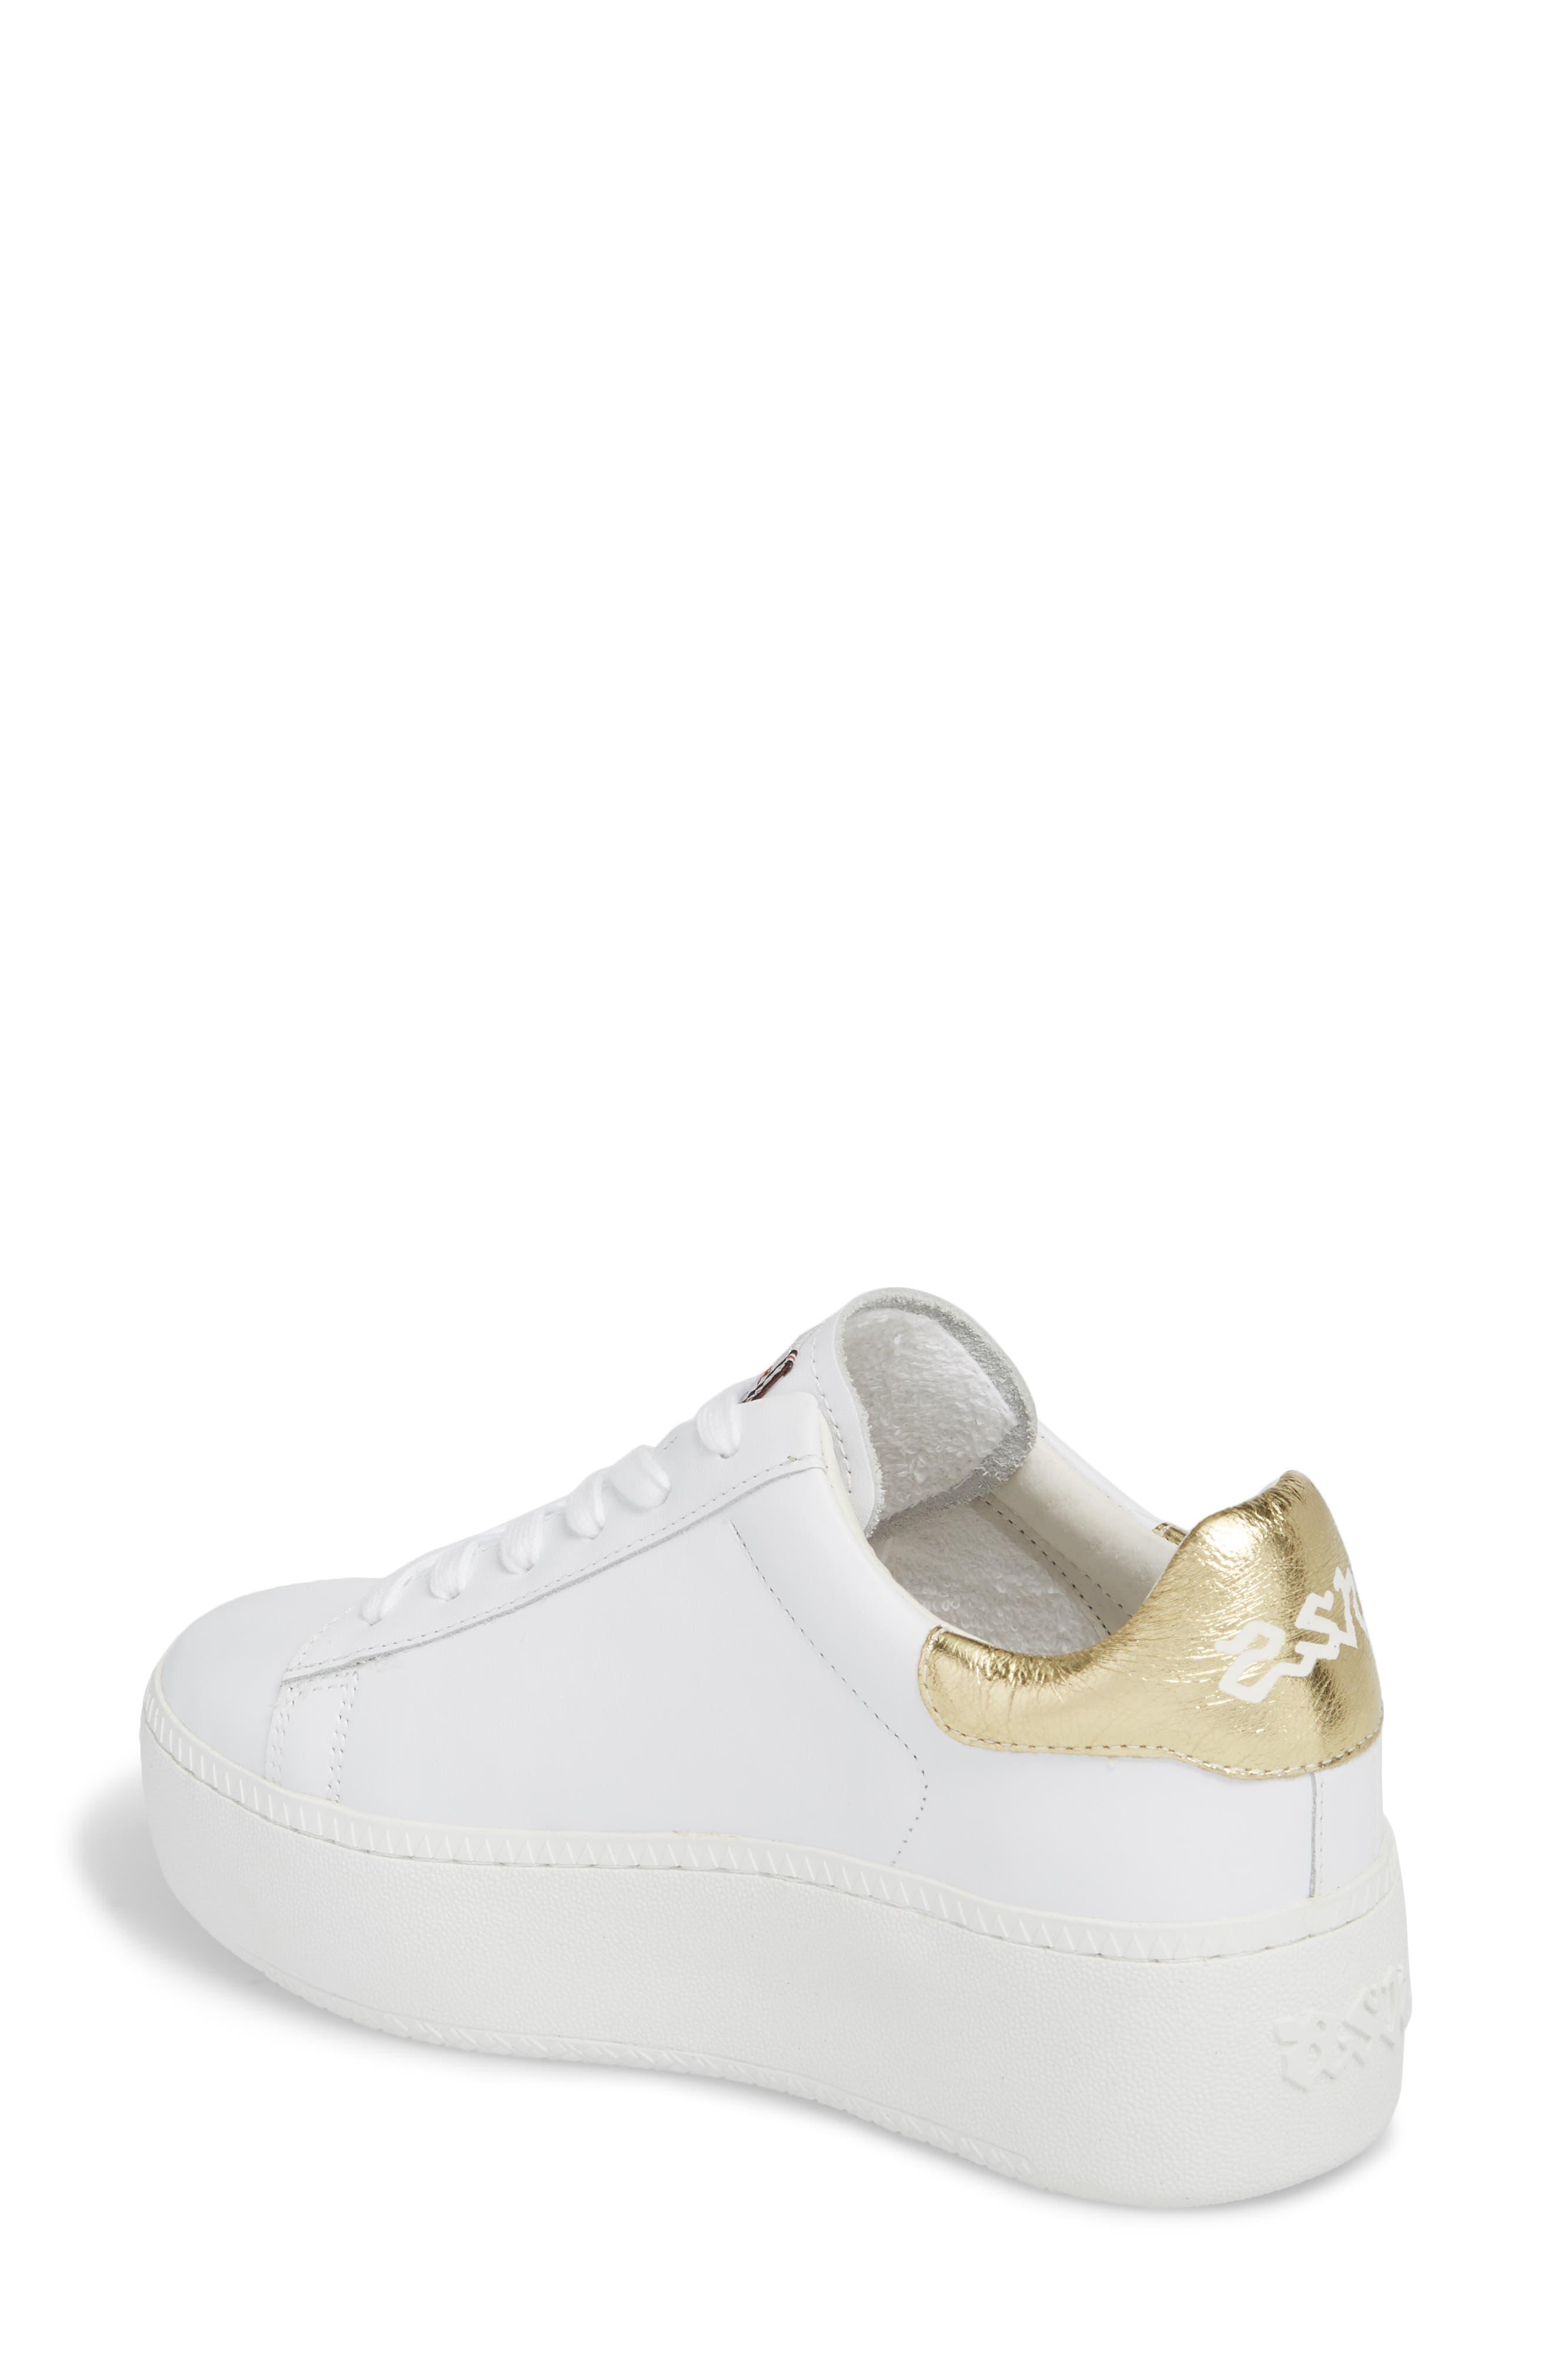 Cult Platform Sneaker,                             Alternate thumbnail 2, color,                             100